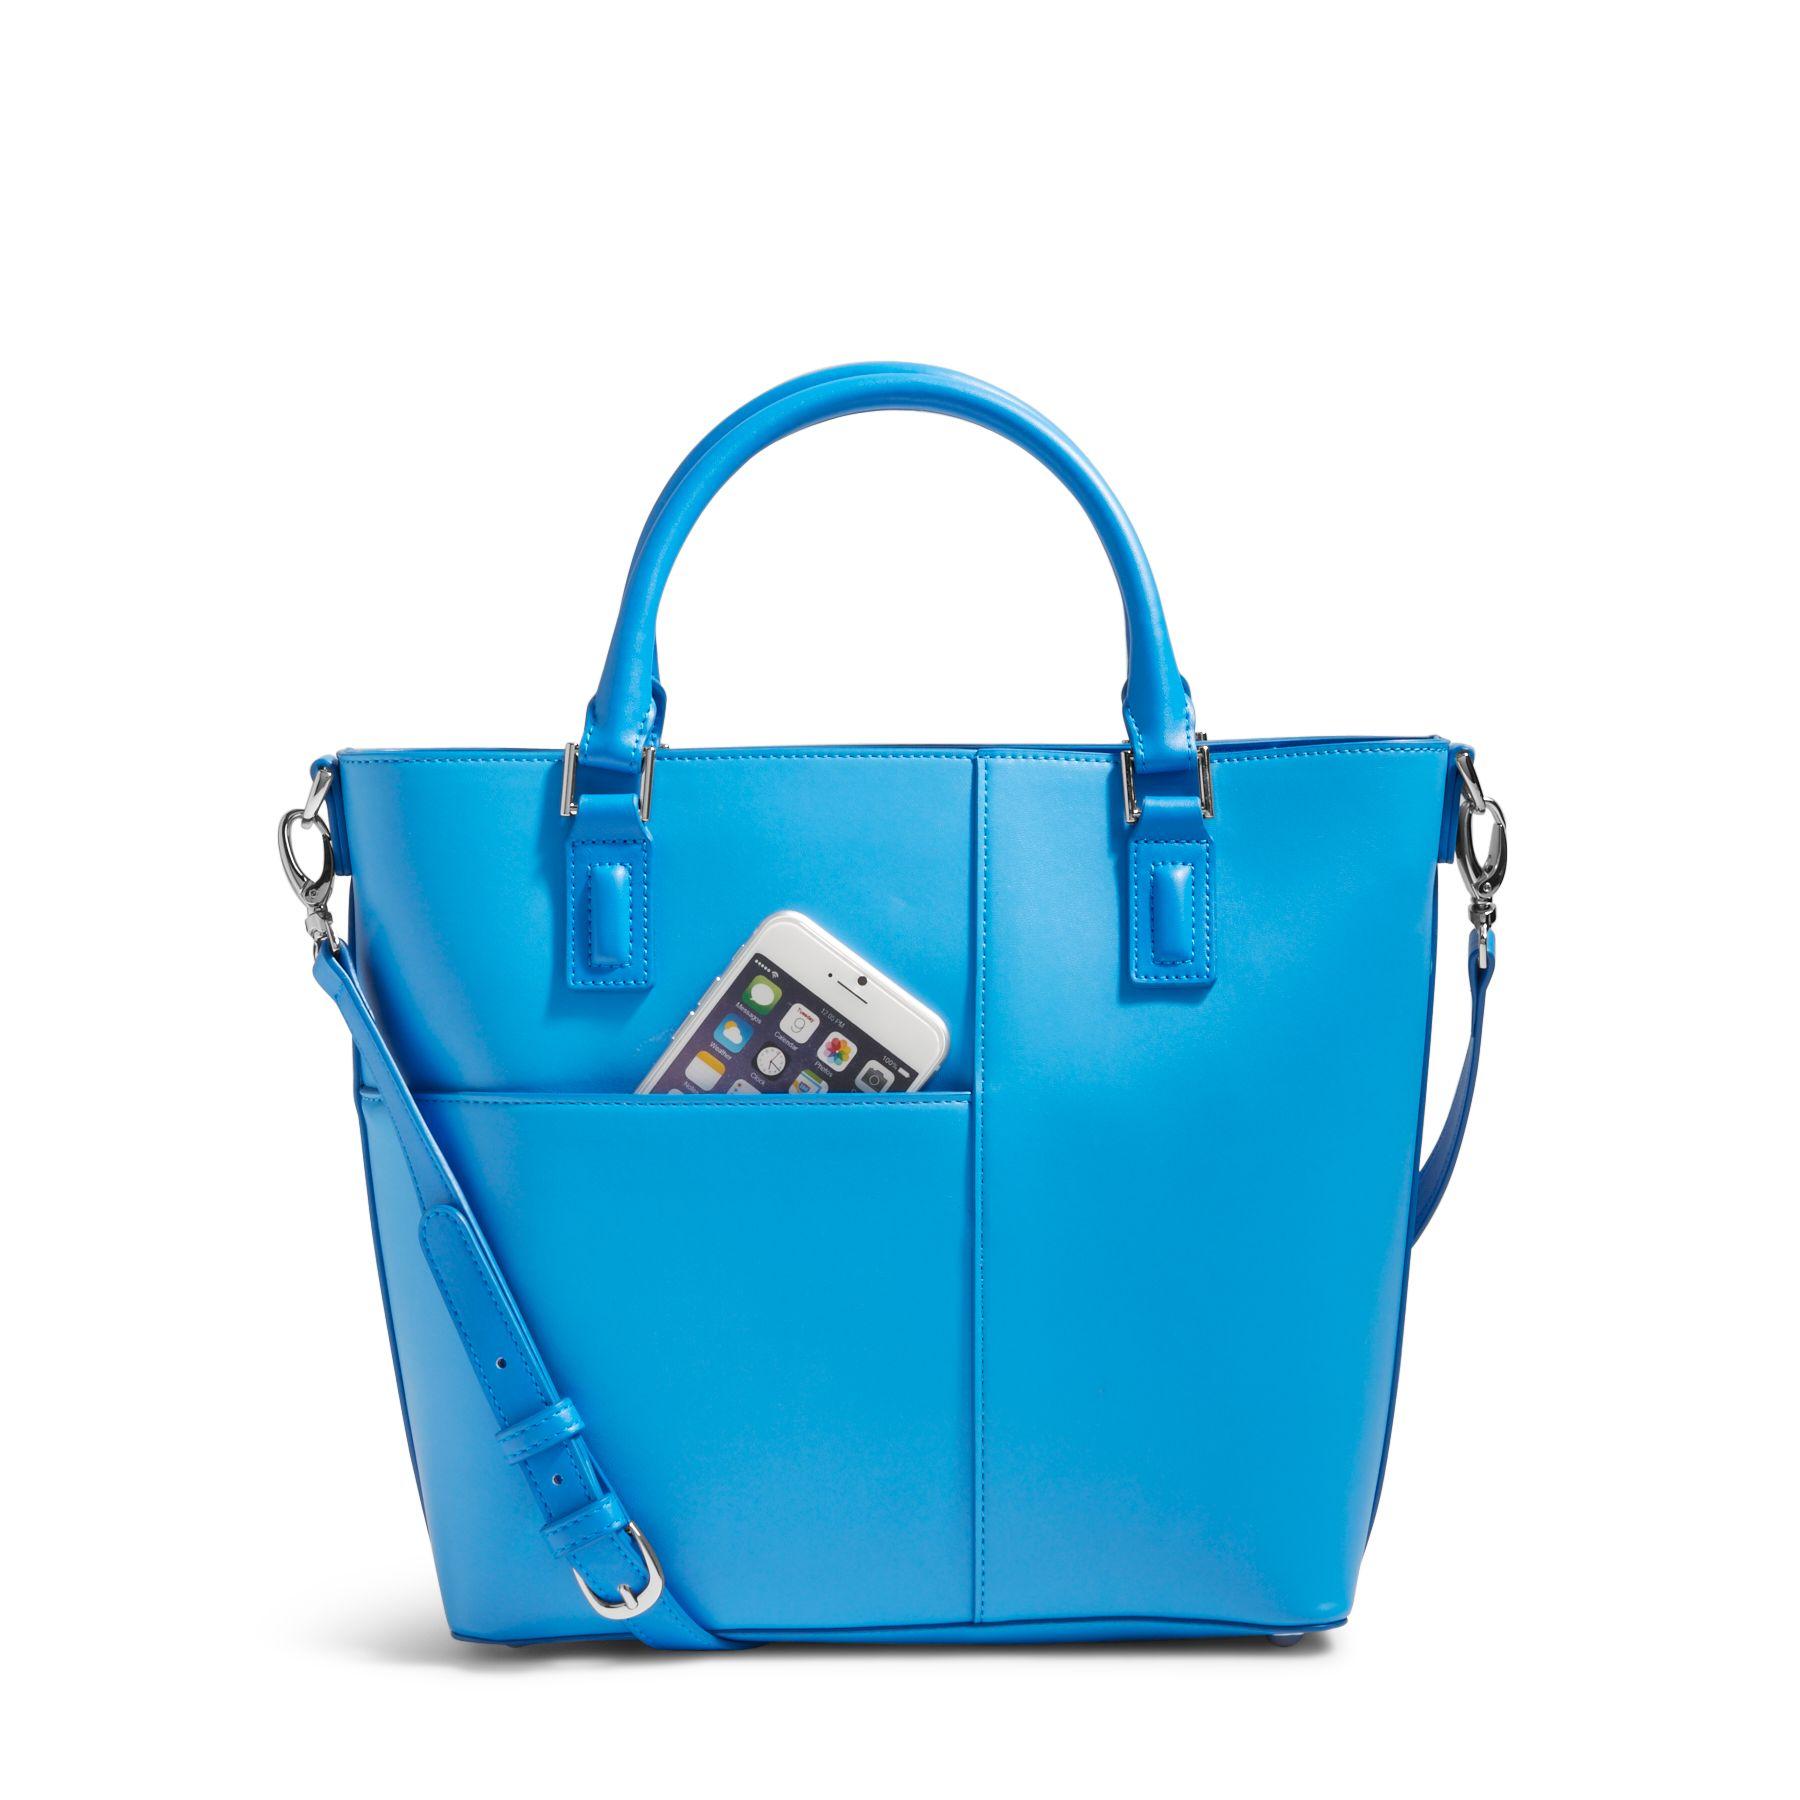 Vera Bradley Faux Leather Composition Satchel Bag | eBay